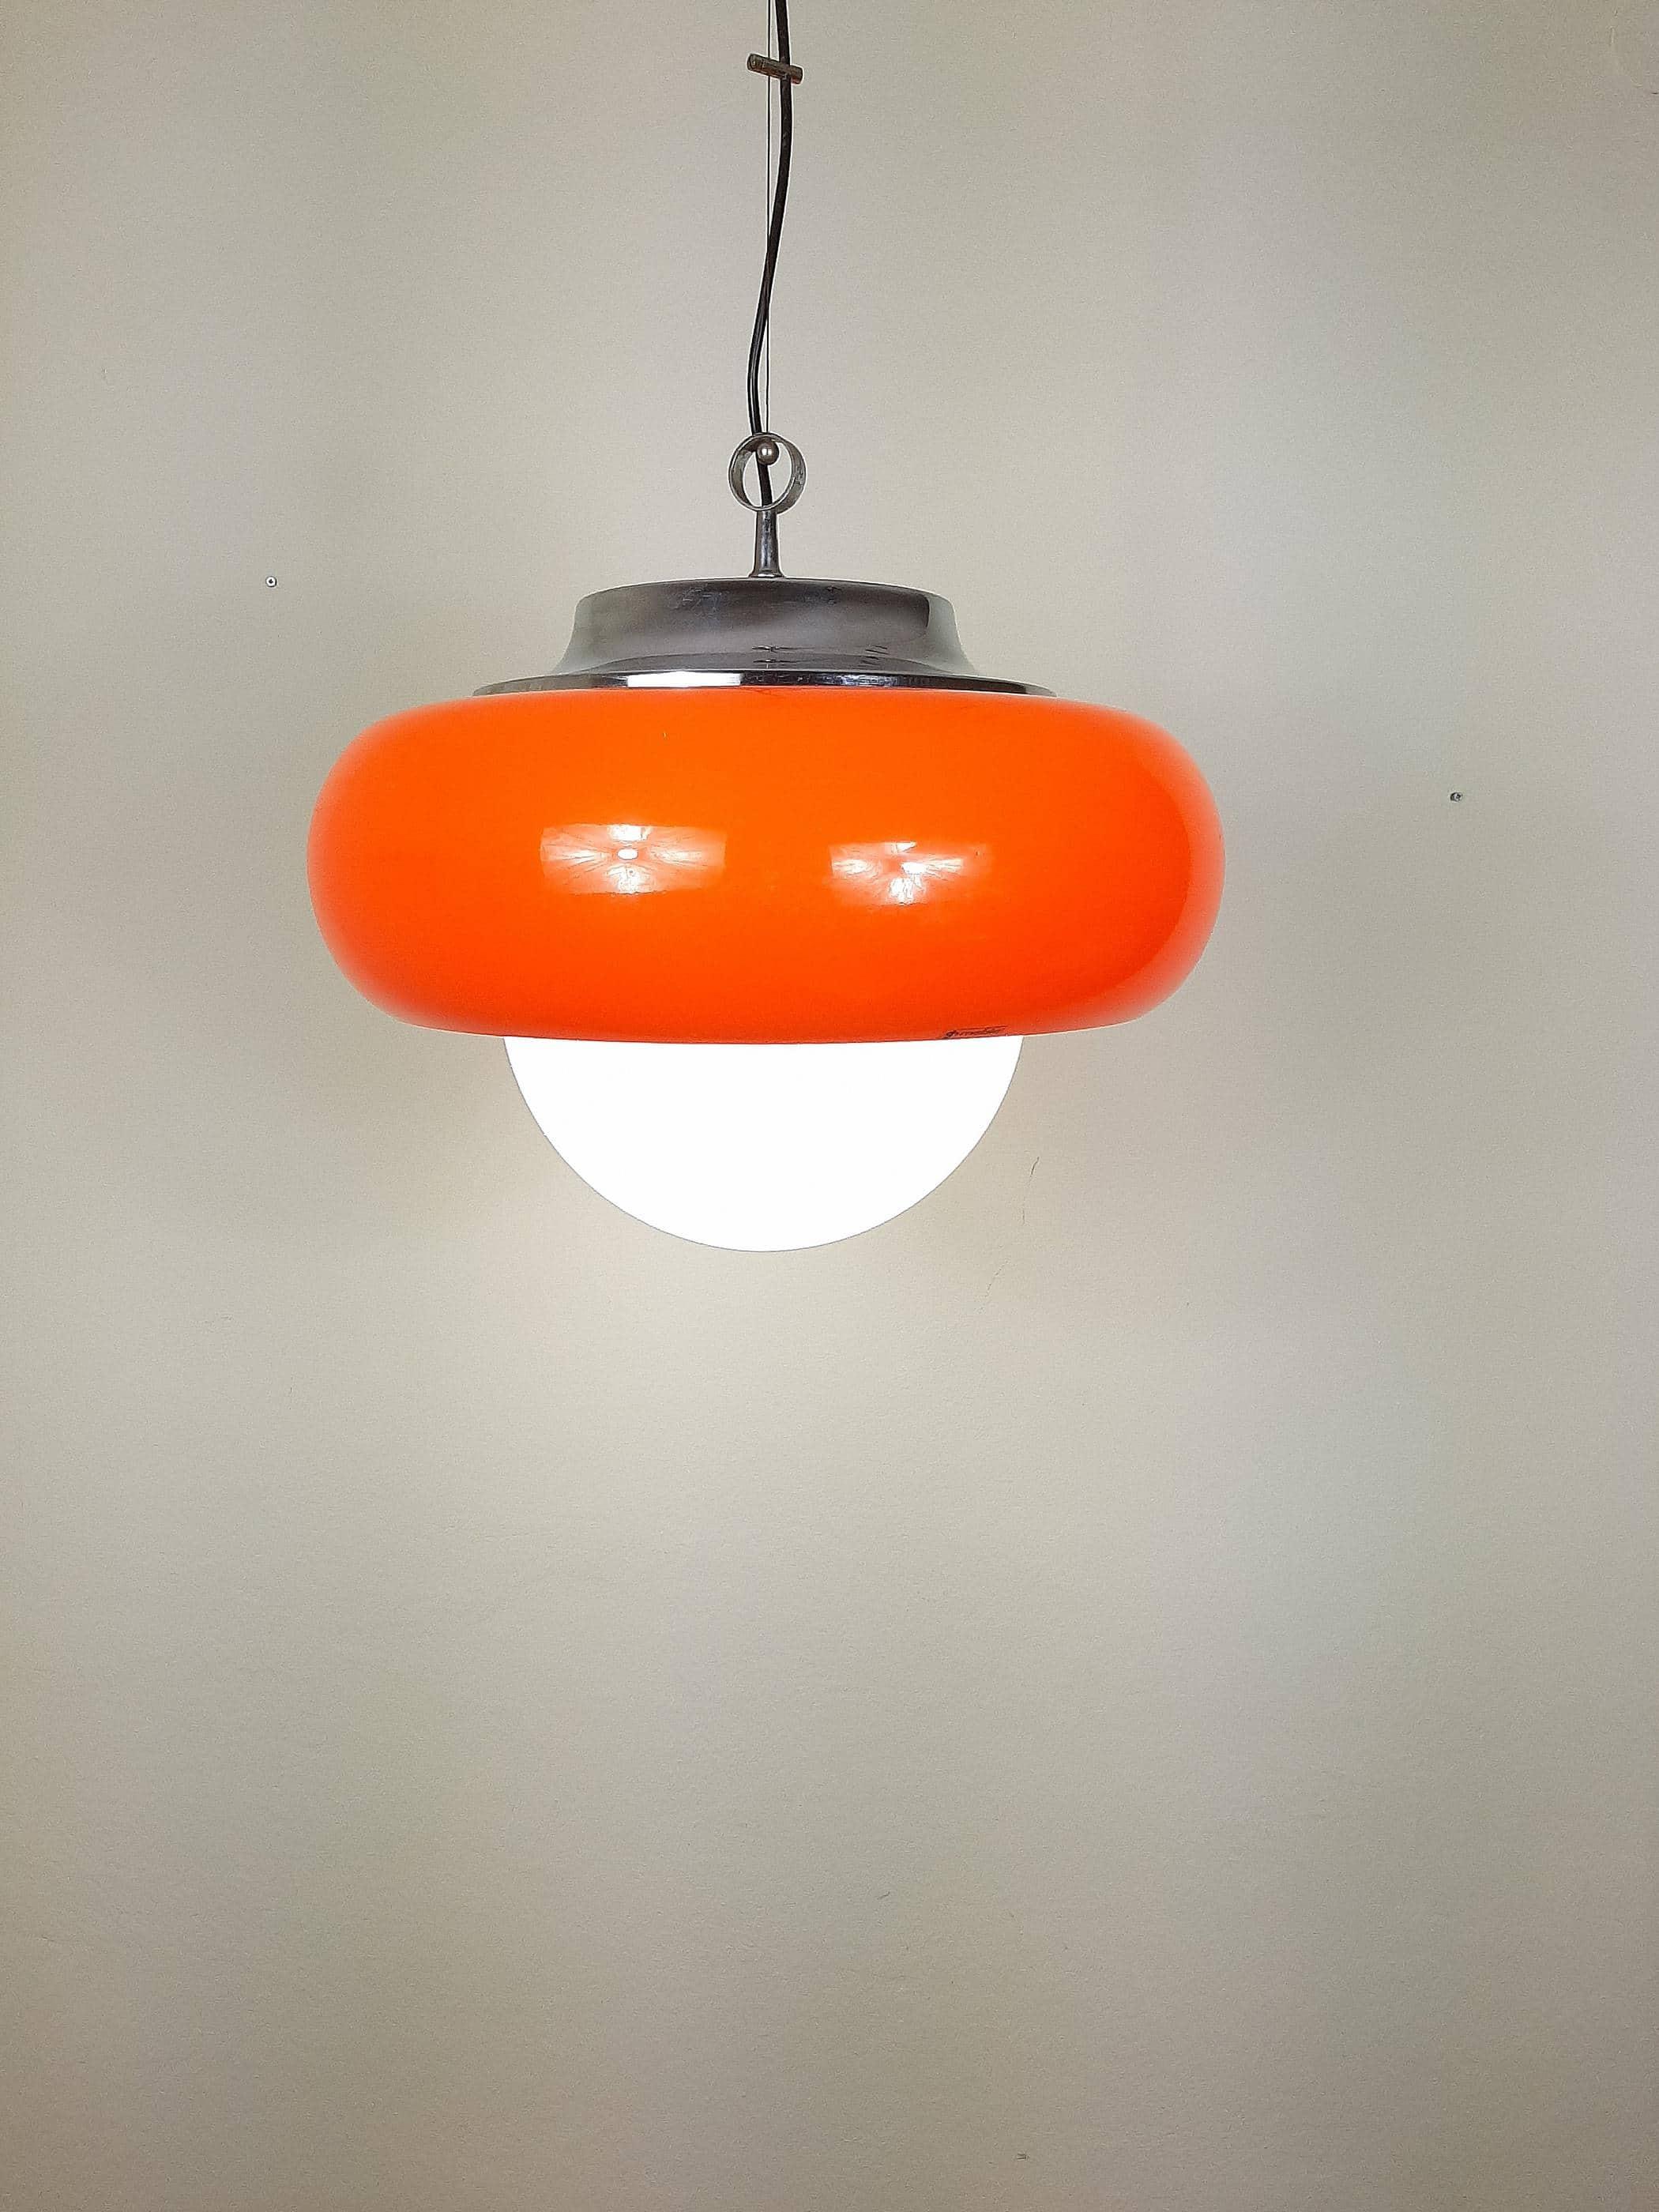 XL Mid-Century Pendant Lamp Vintage Ceiling Lamp Best Meblo For Guzzini 1970 Made in Italy Orange Ø 50 cm Space Age Modern Retro Hanging Light